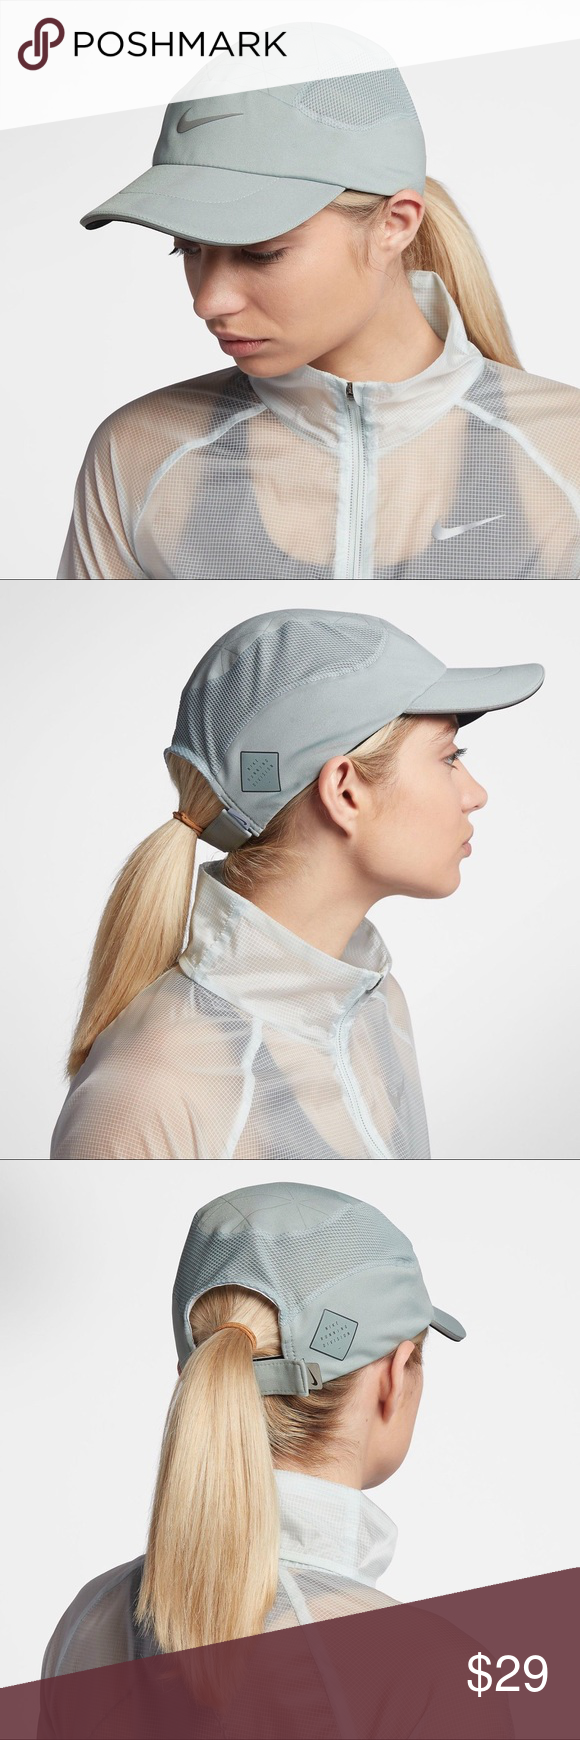 Nike Aerobill Tailwind Run Division Hat Unisex Nike Women Nike Accessories